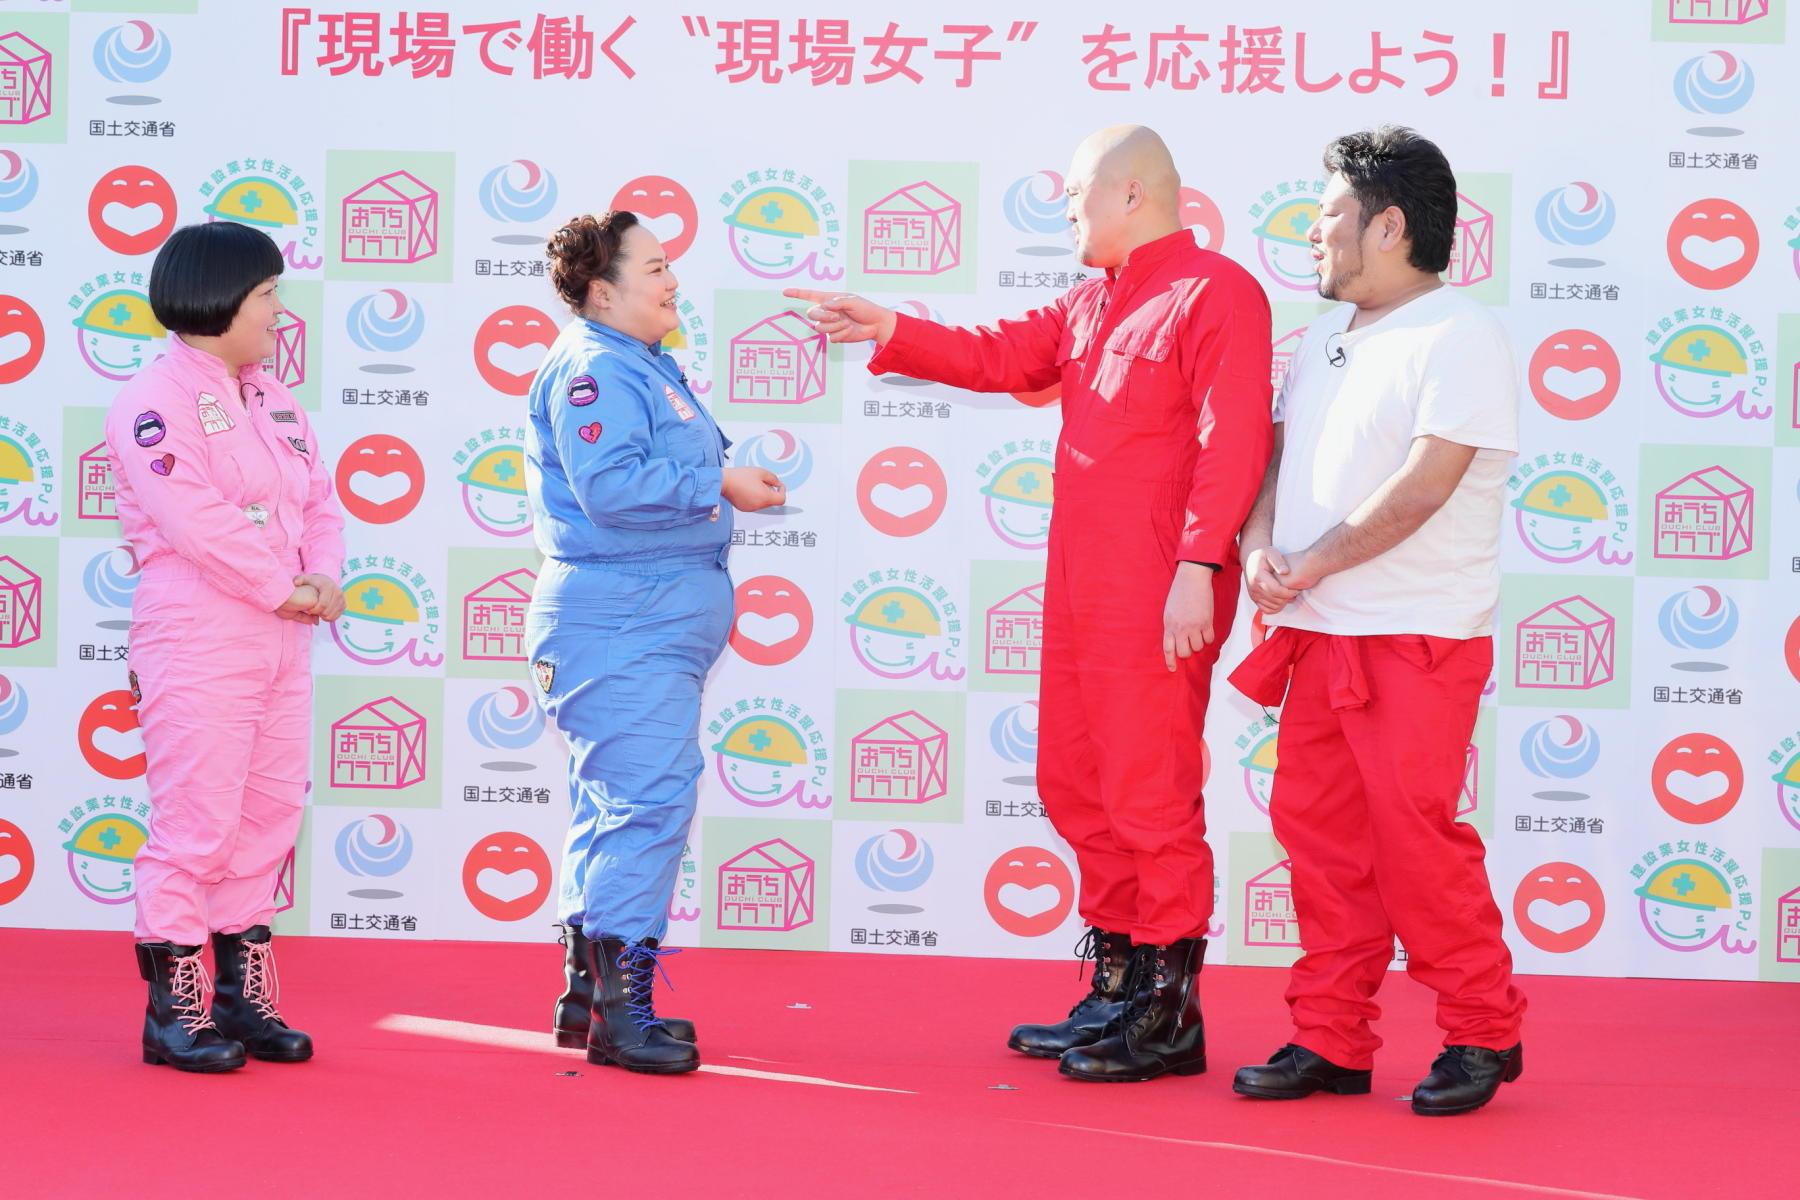 http://news.yoshimoto.co.jp/20170226095352-aca33e5d3cdb141b81488849131f911d988640f6.jpg